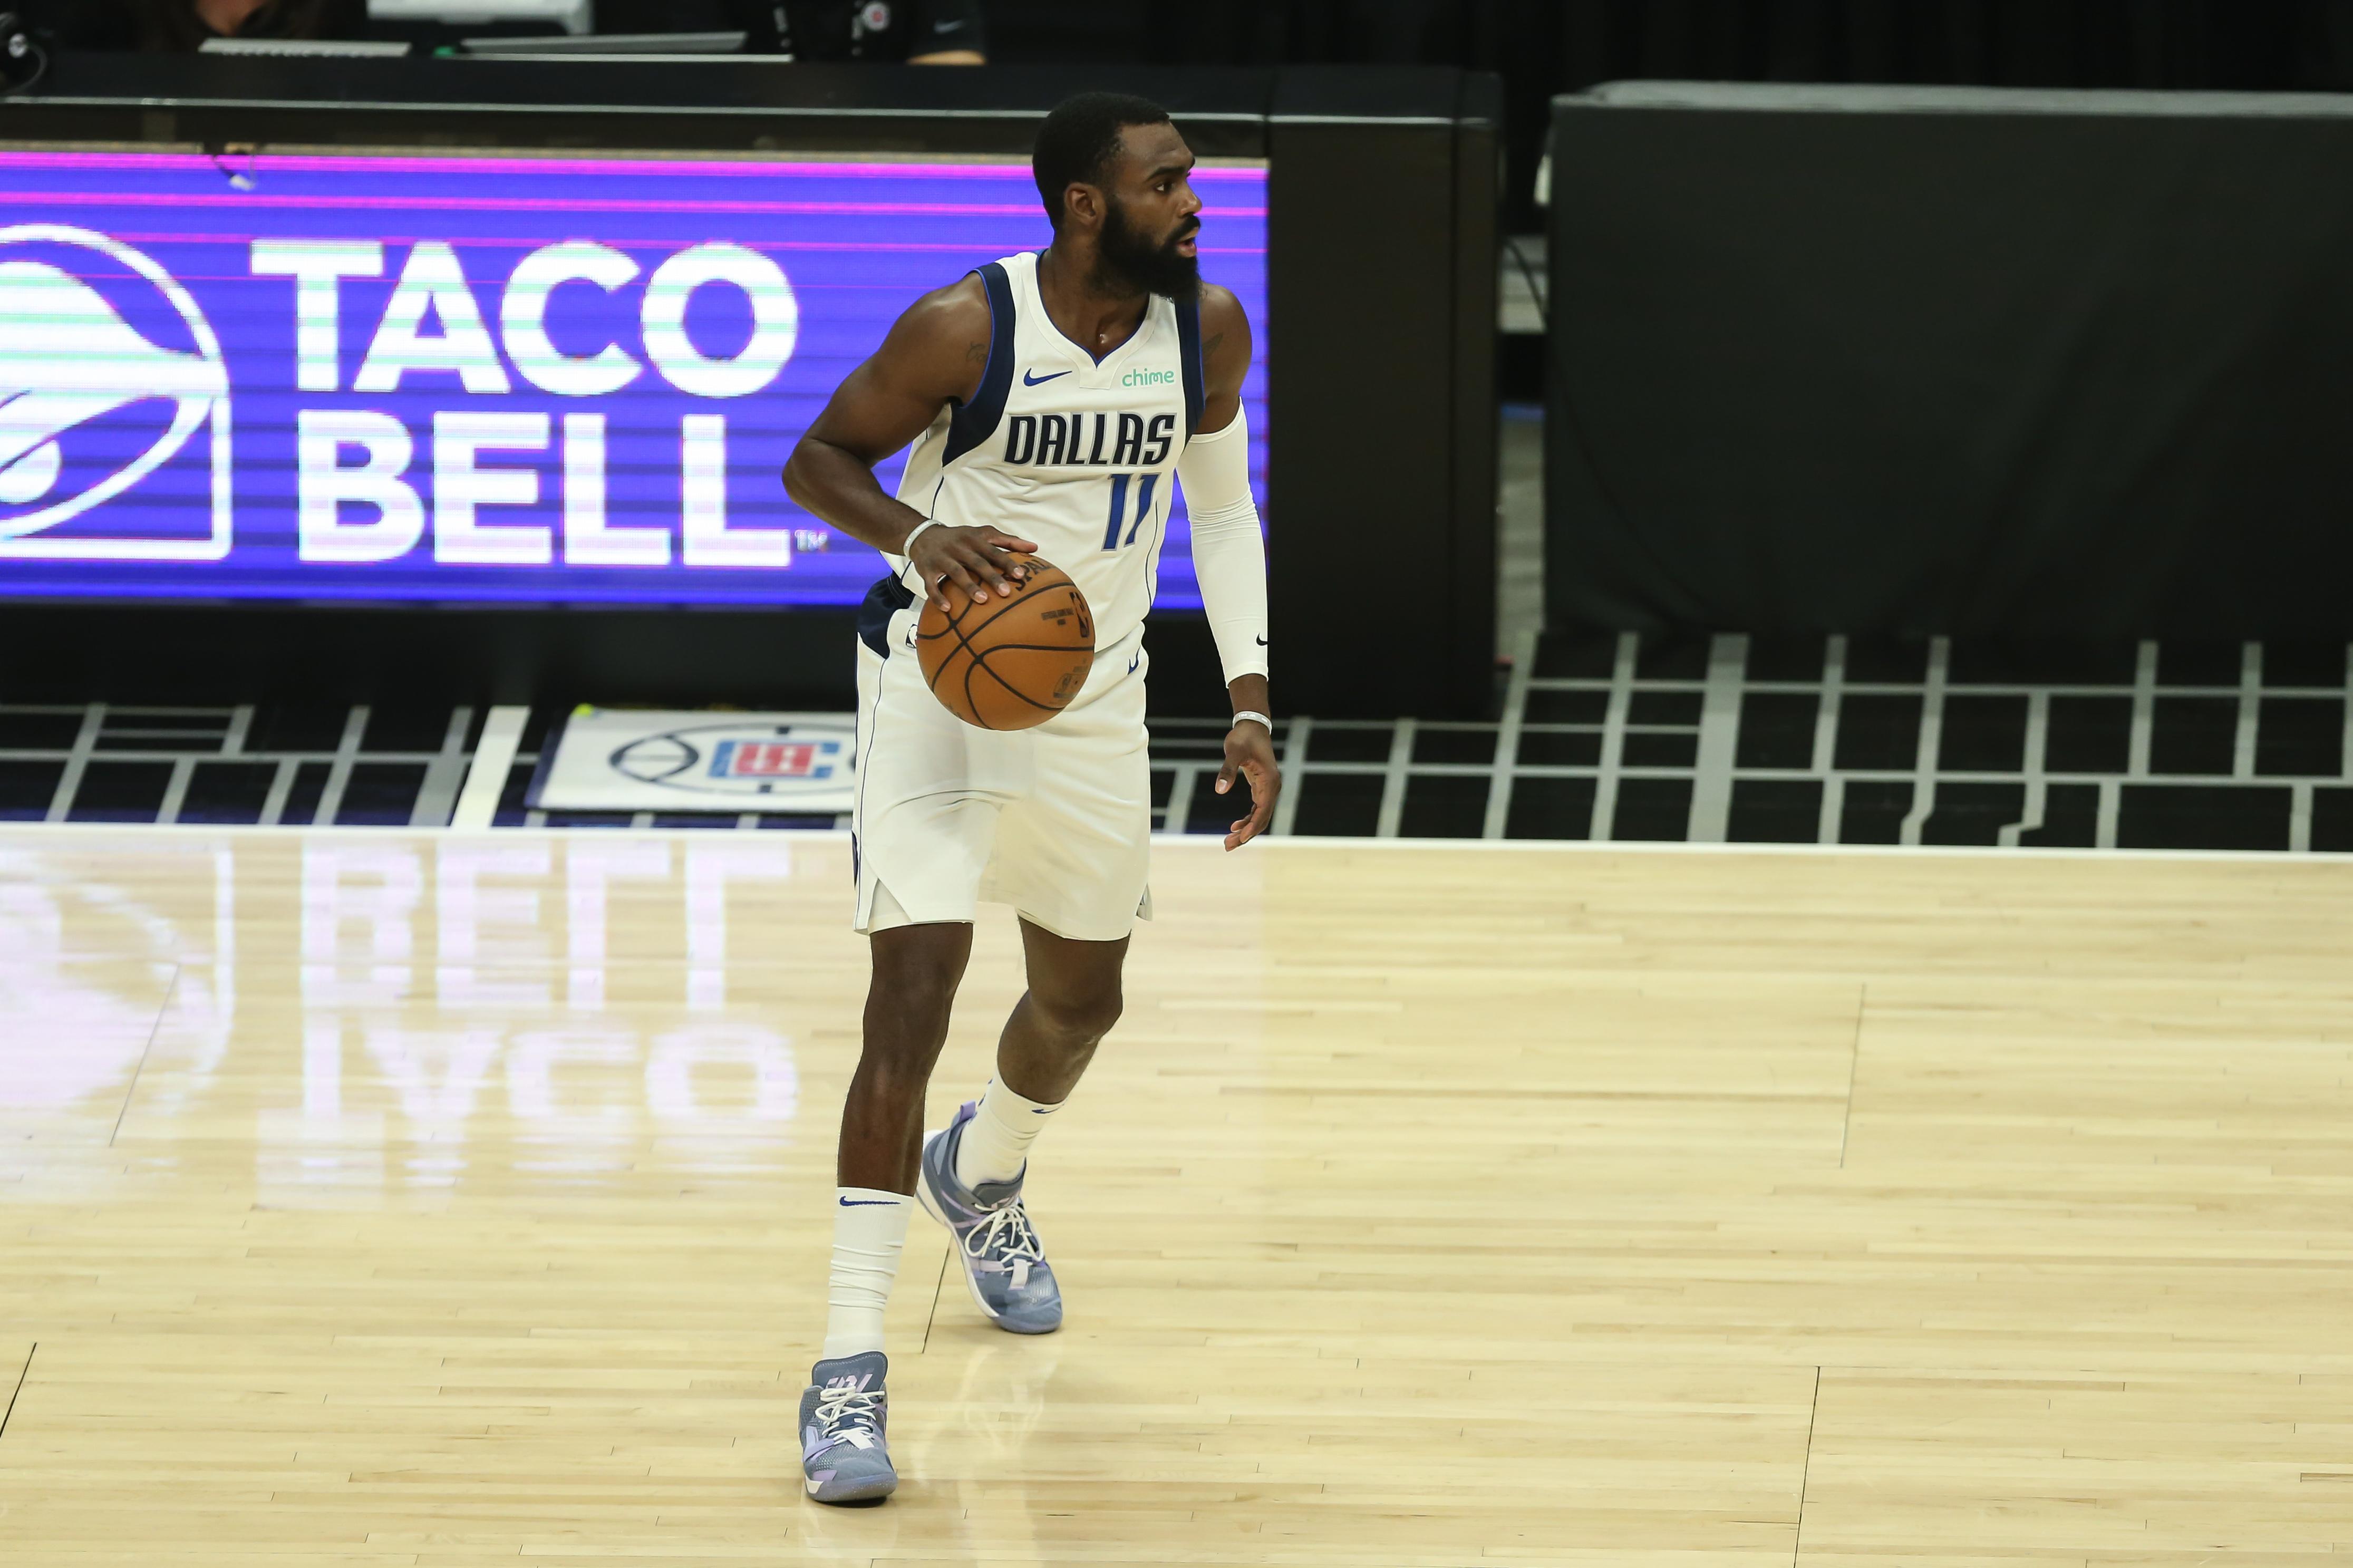 NBA: JUN 06 Western Conference Playoffs First Round - Mavericks at Clippers